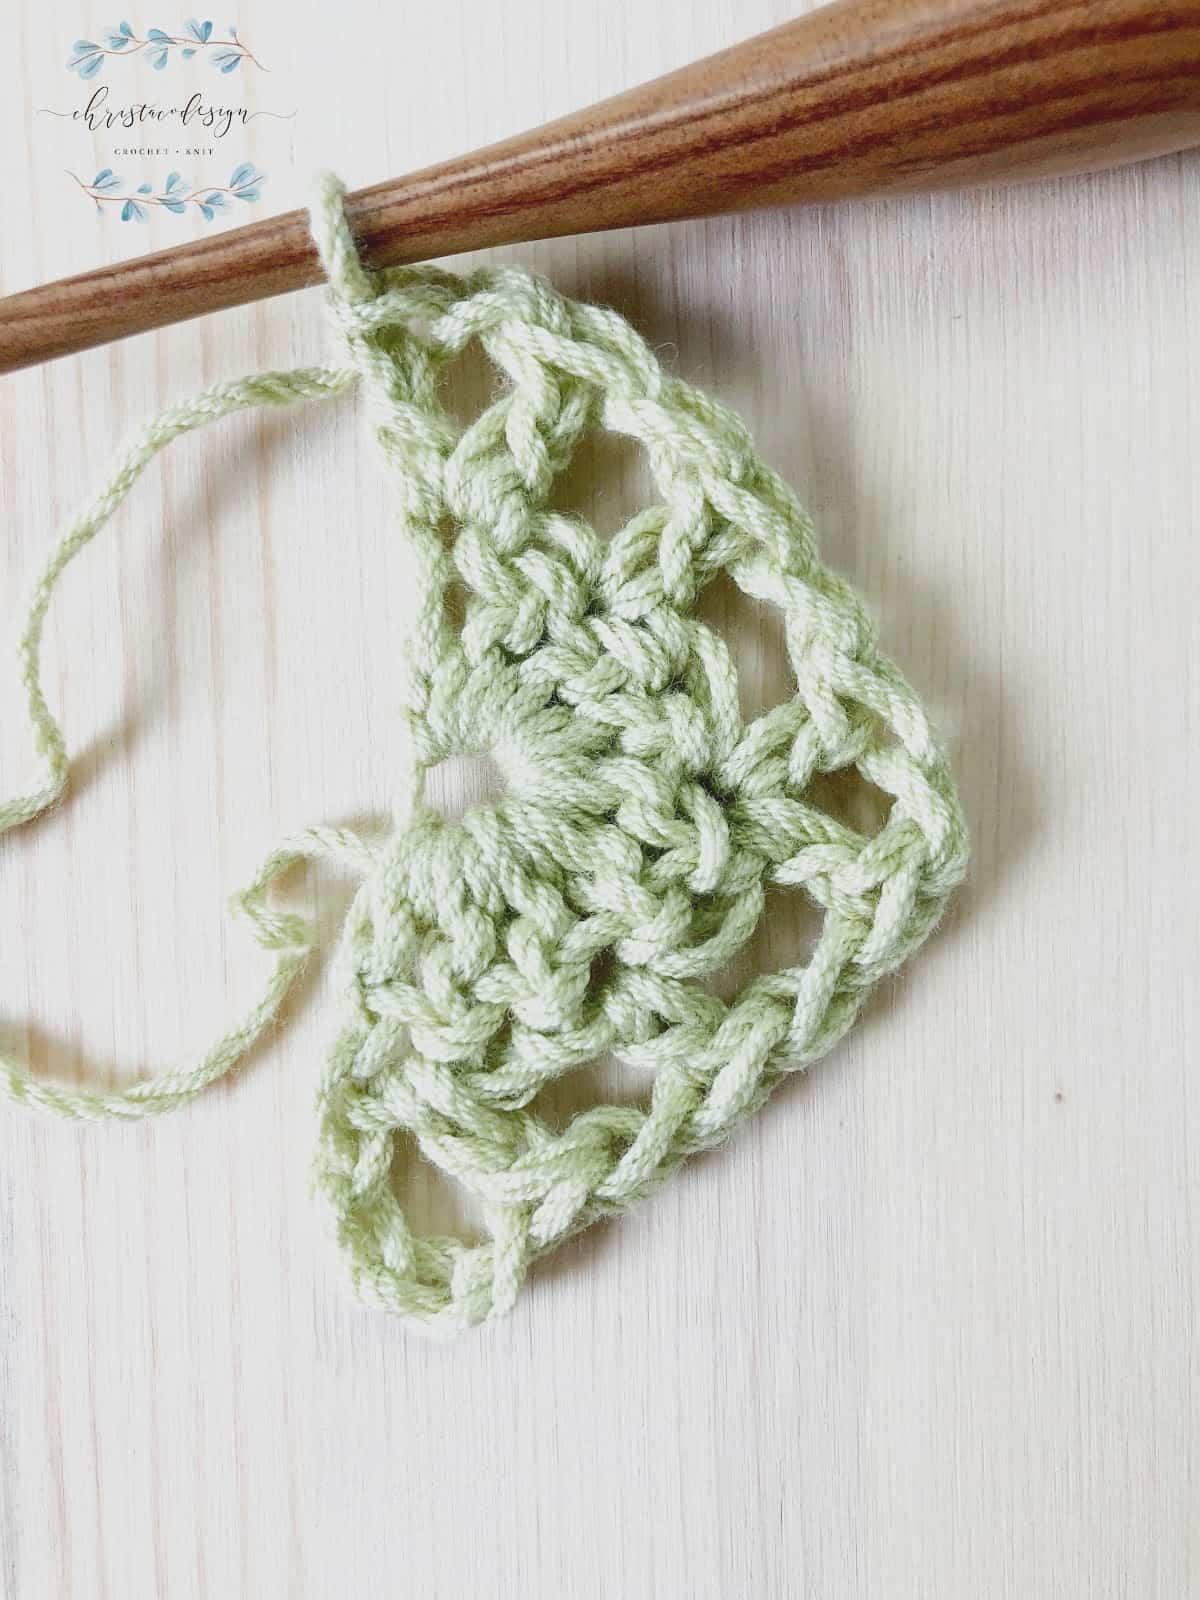 Beginner triangle shawl free pattern row 2.